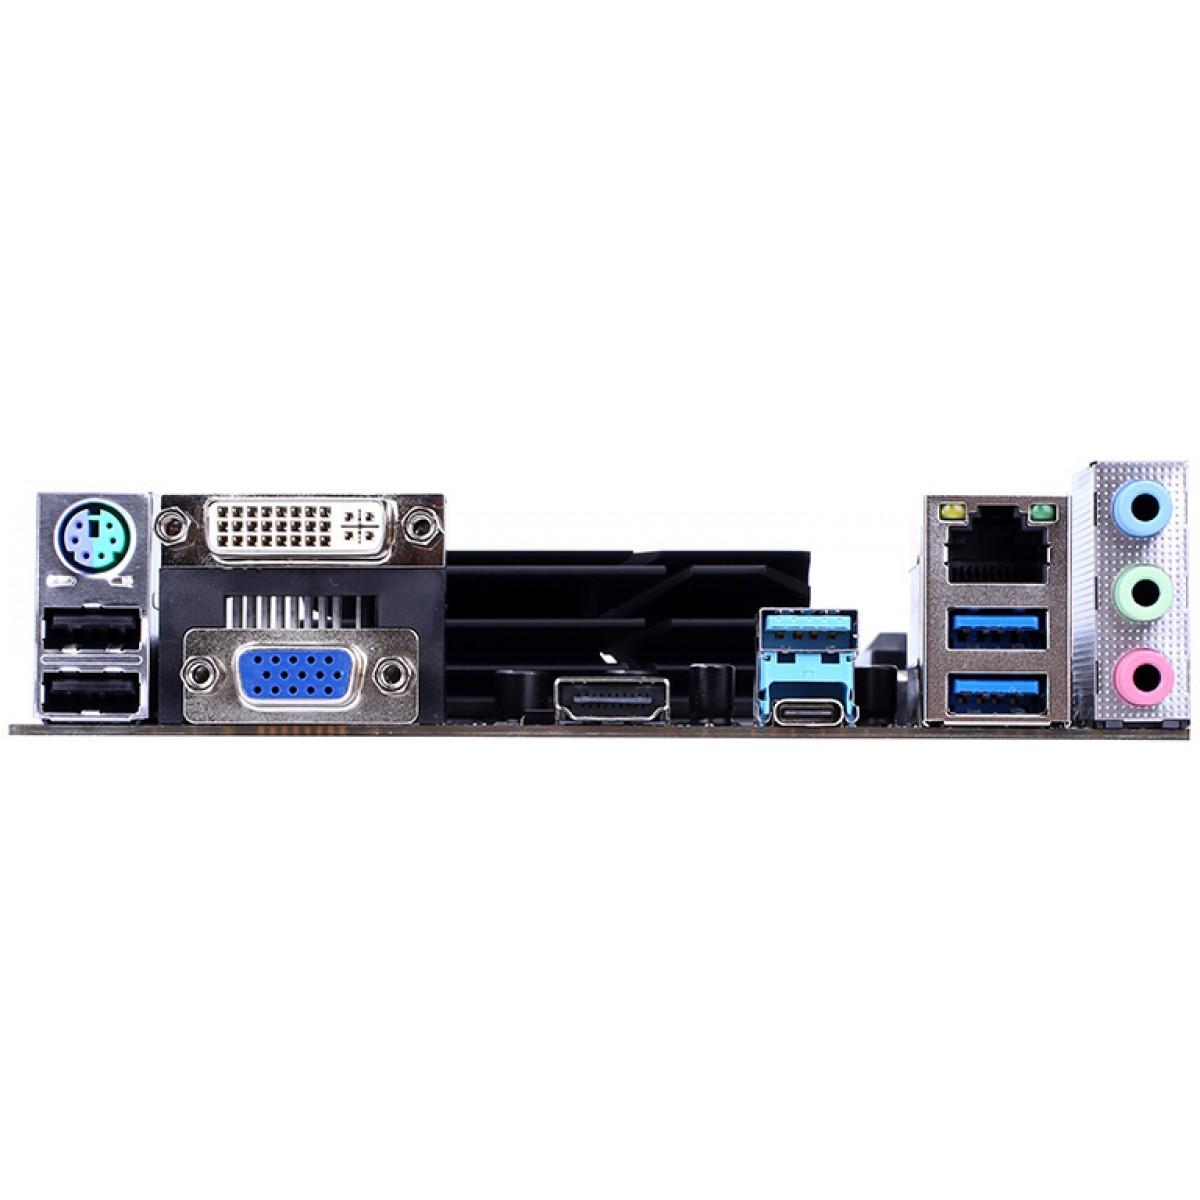 Placa Mãe Colorful Battle-AX B450M-G Deluxe V14, Chipset B450, AMD AM4, mATX, DDR4